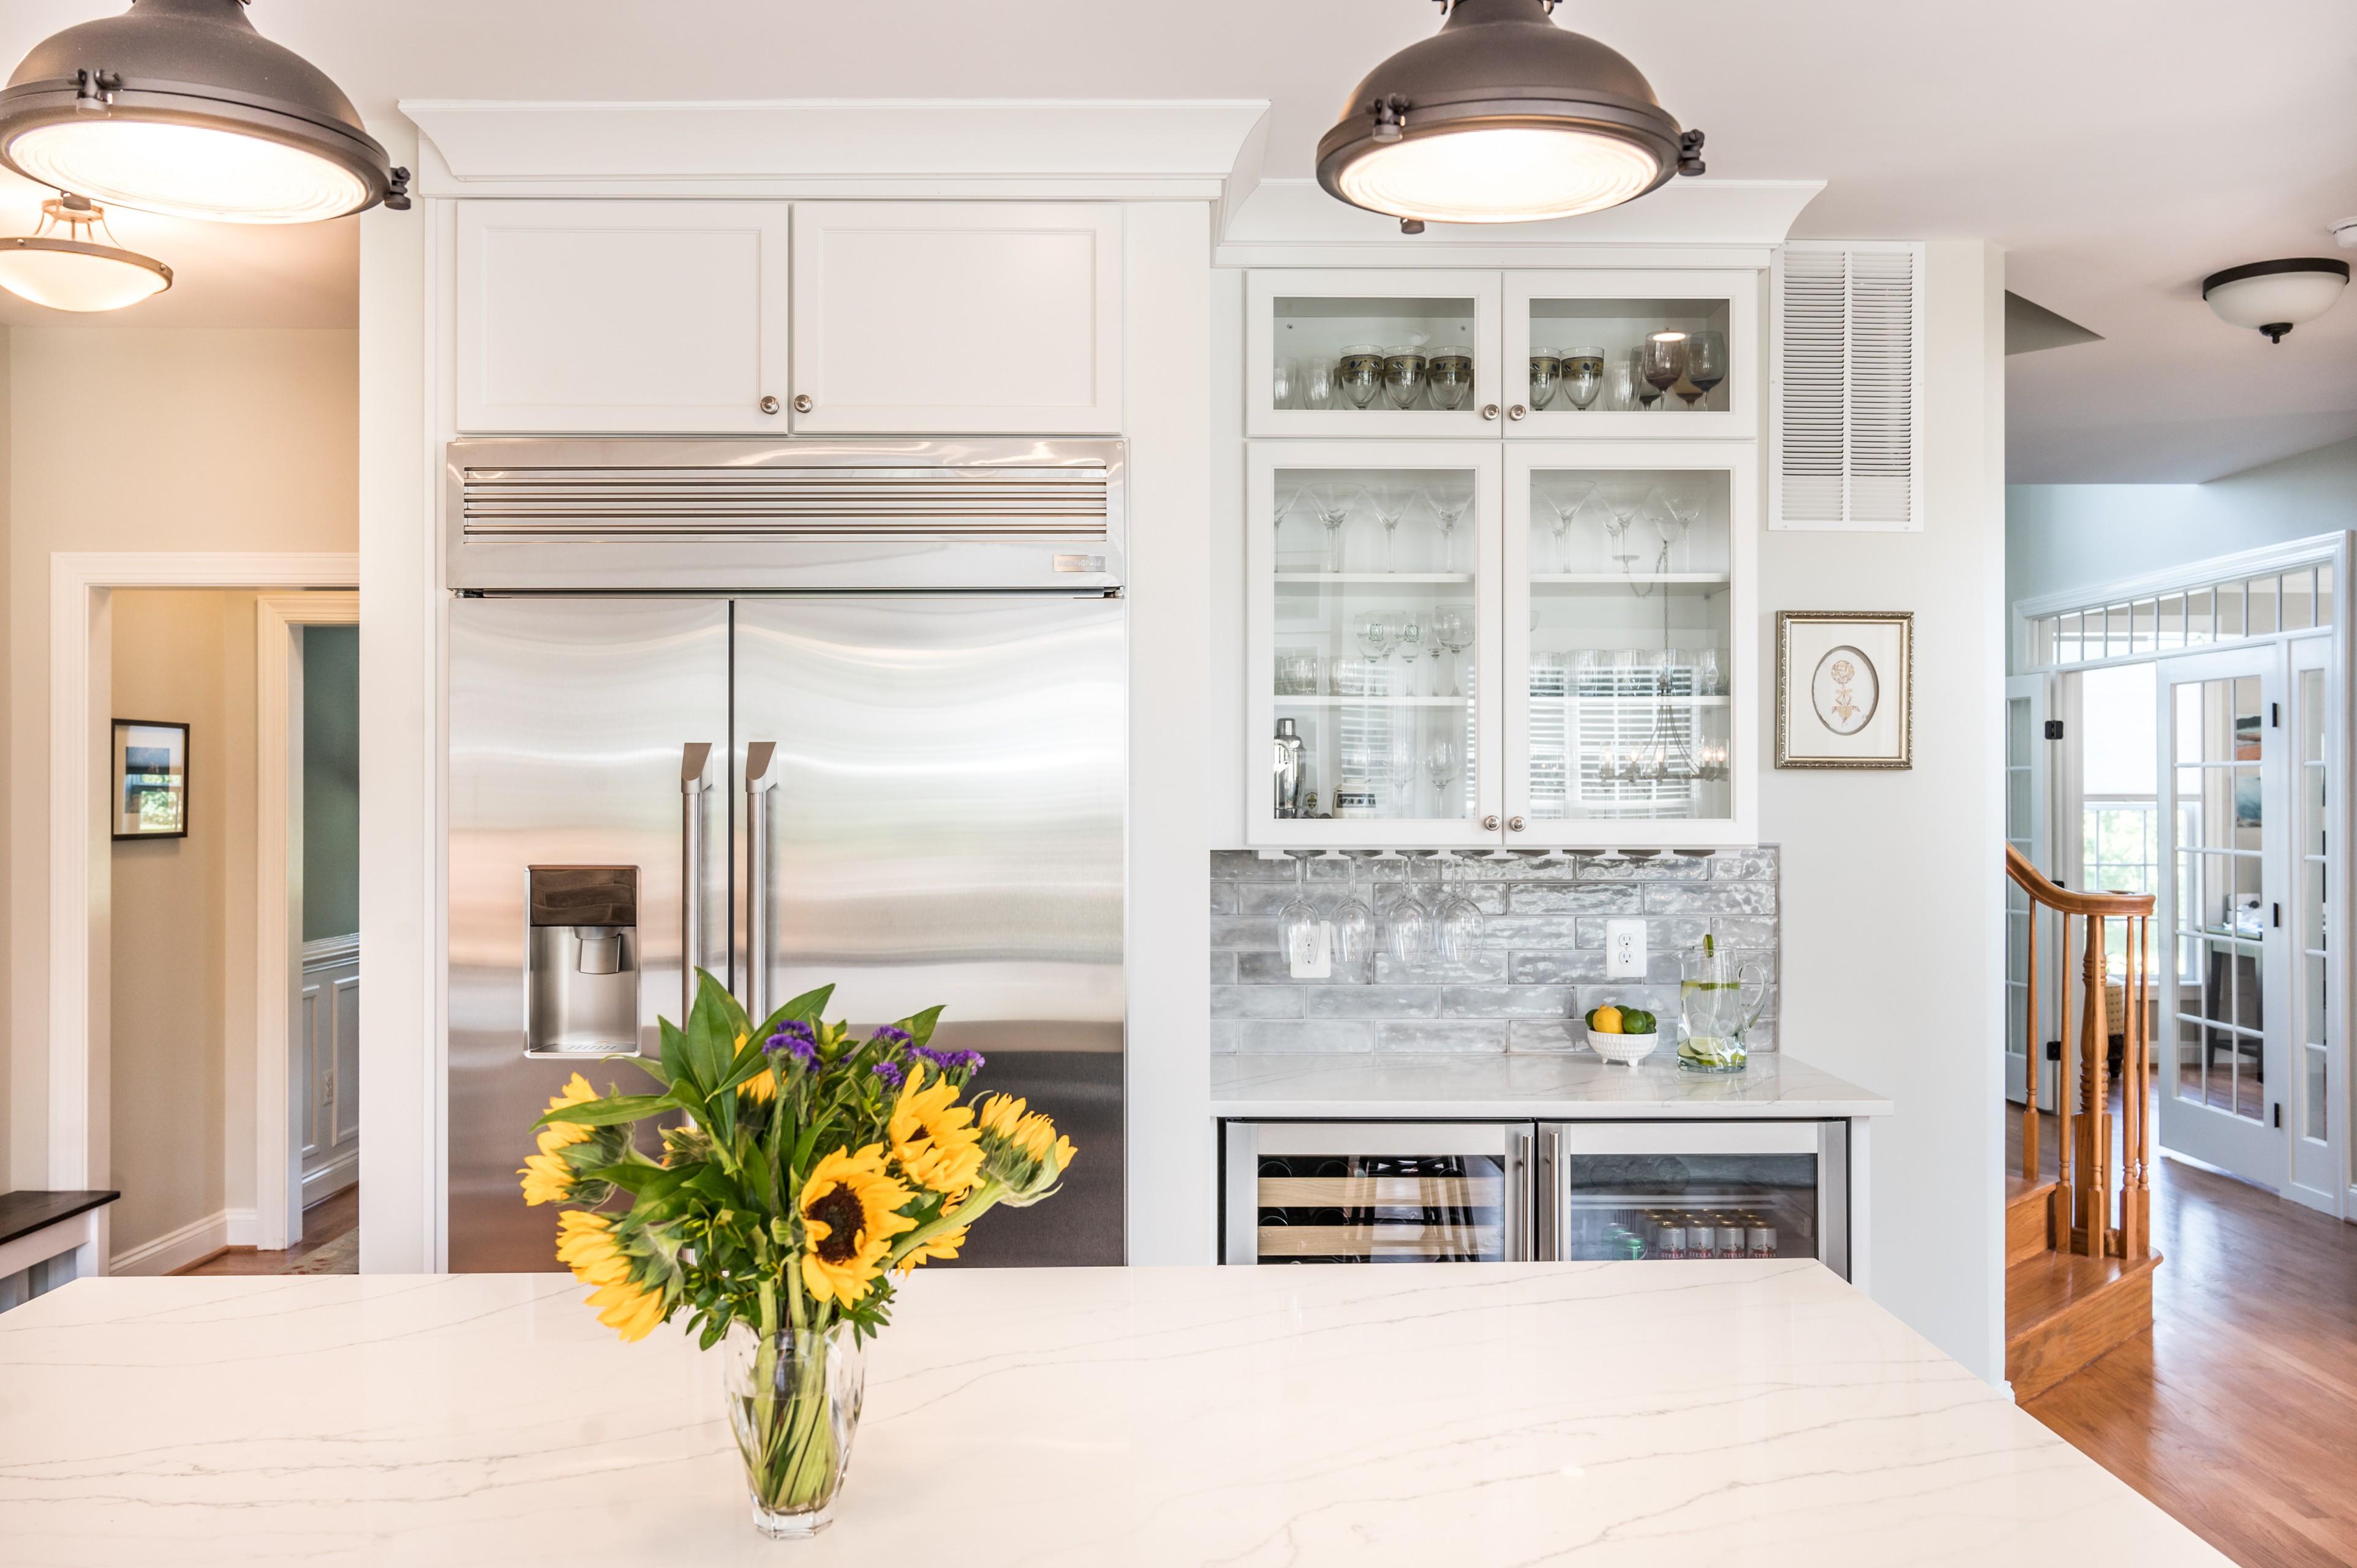 Monogram Refrigerator and Beverage Coolers